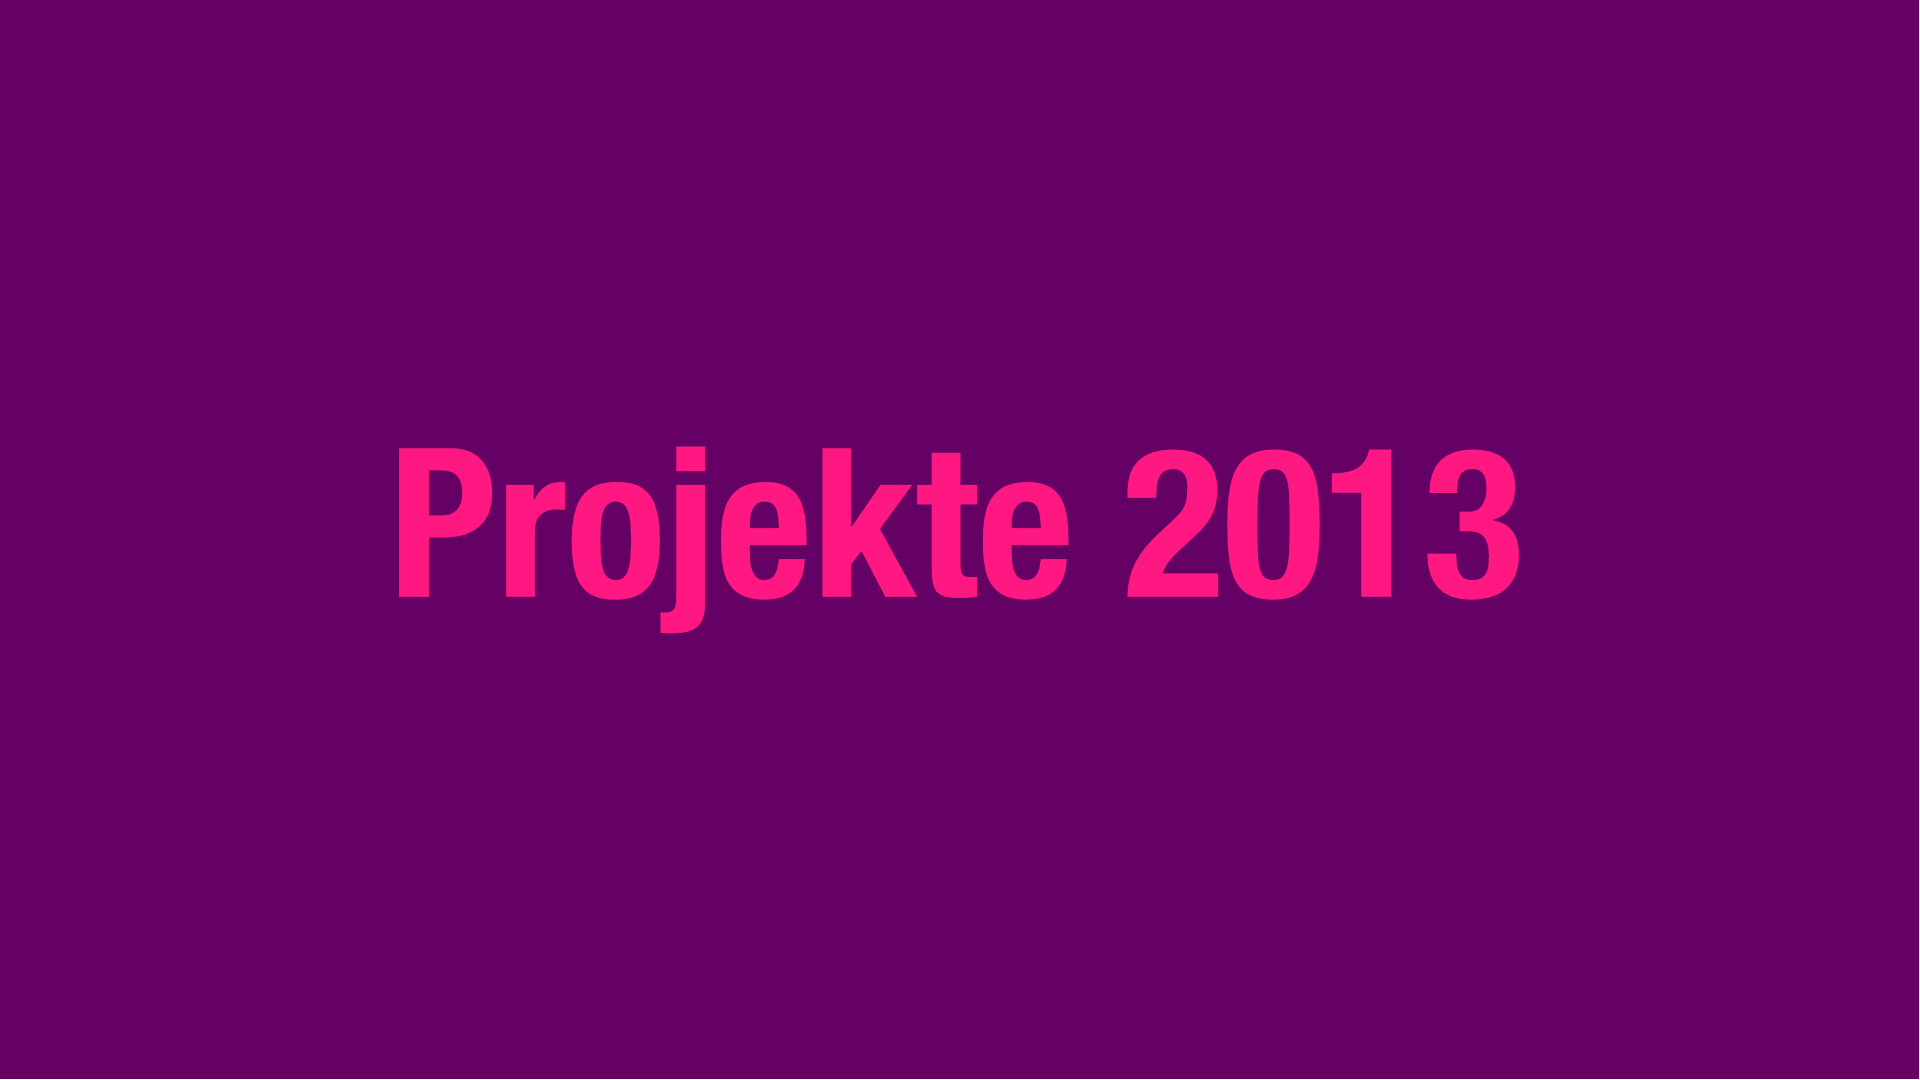 Projekte 2013